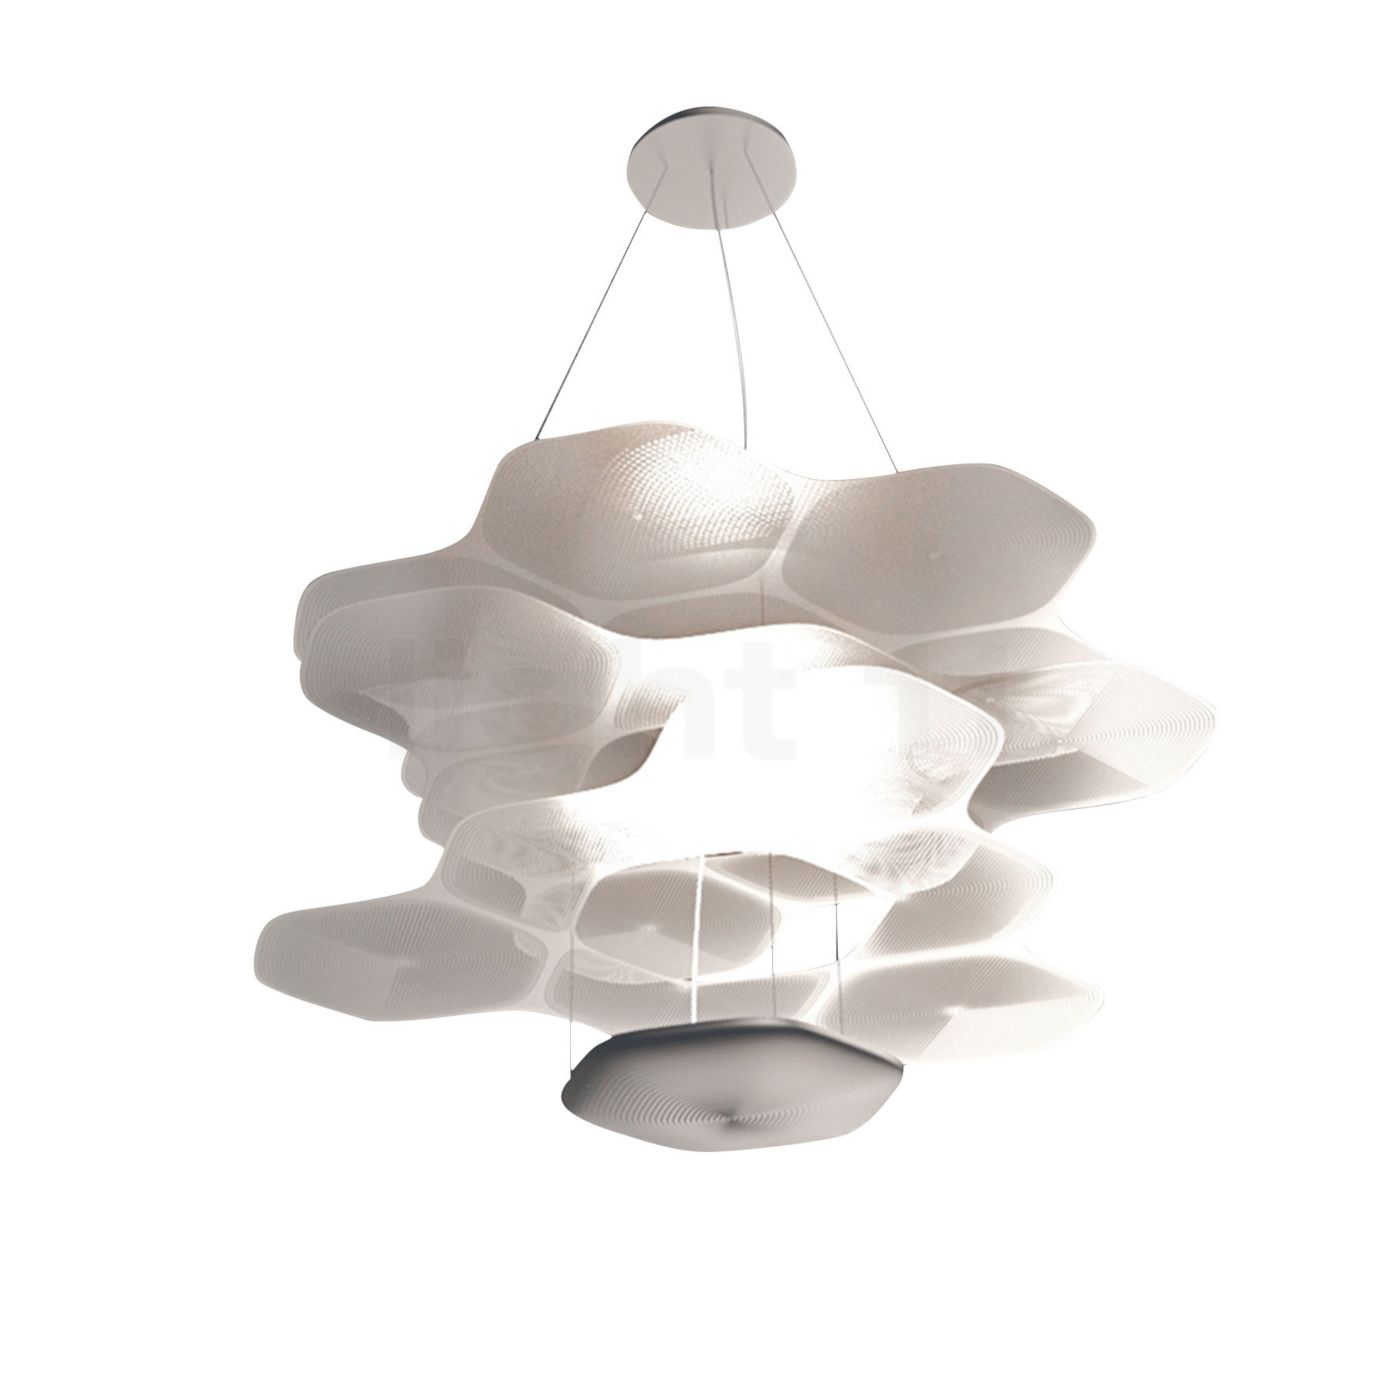 coco sale size republic one oly cloud lights chandelier homewares glass lighting muriel light ceiling